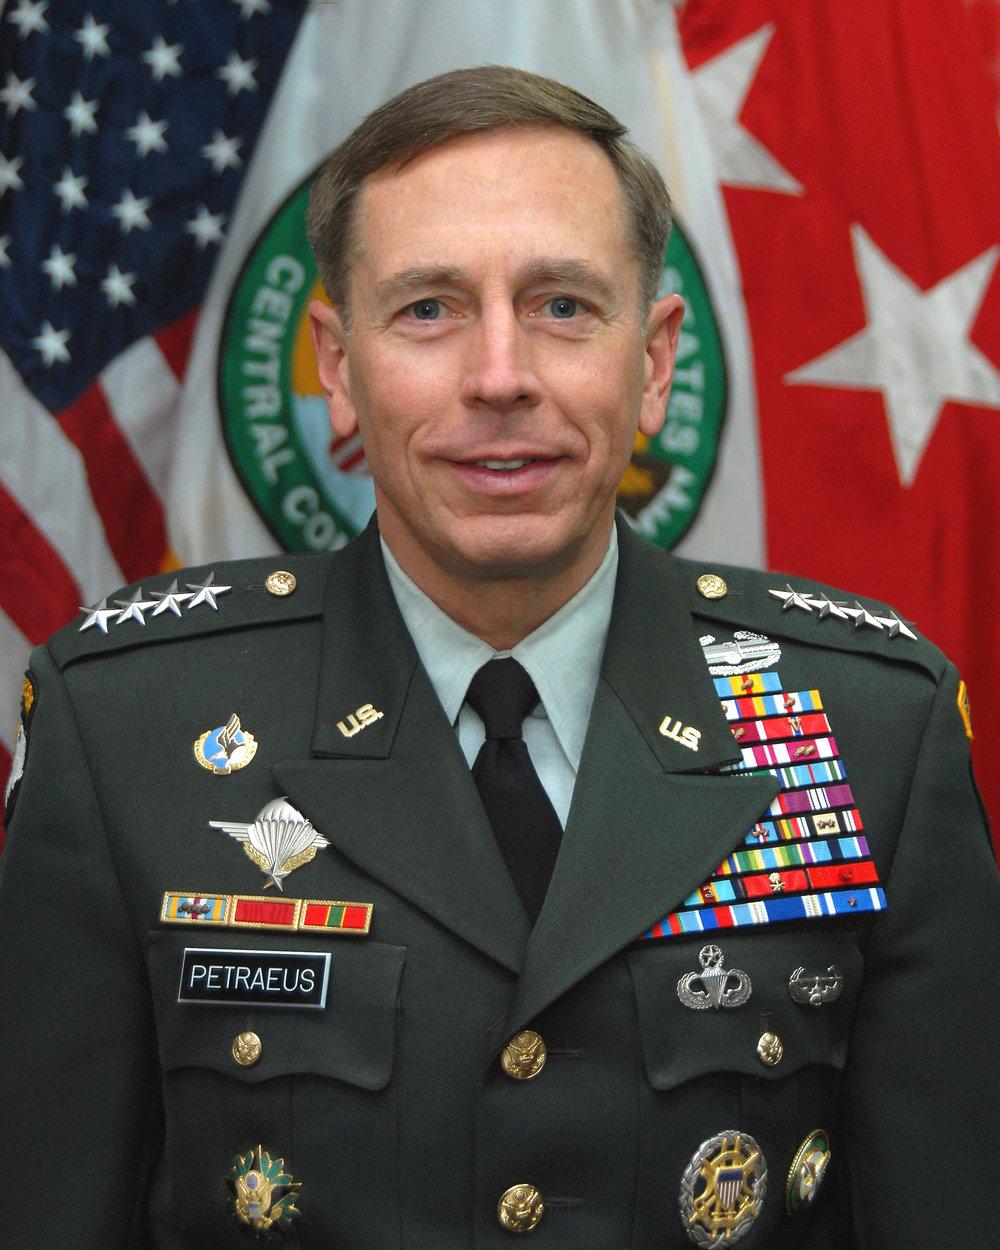 2008: General David H. Petraeus